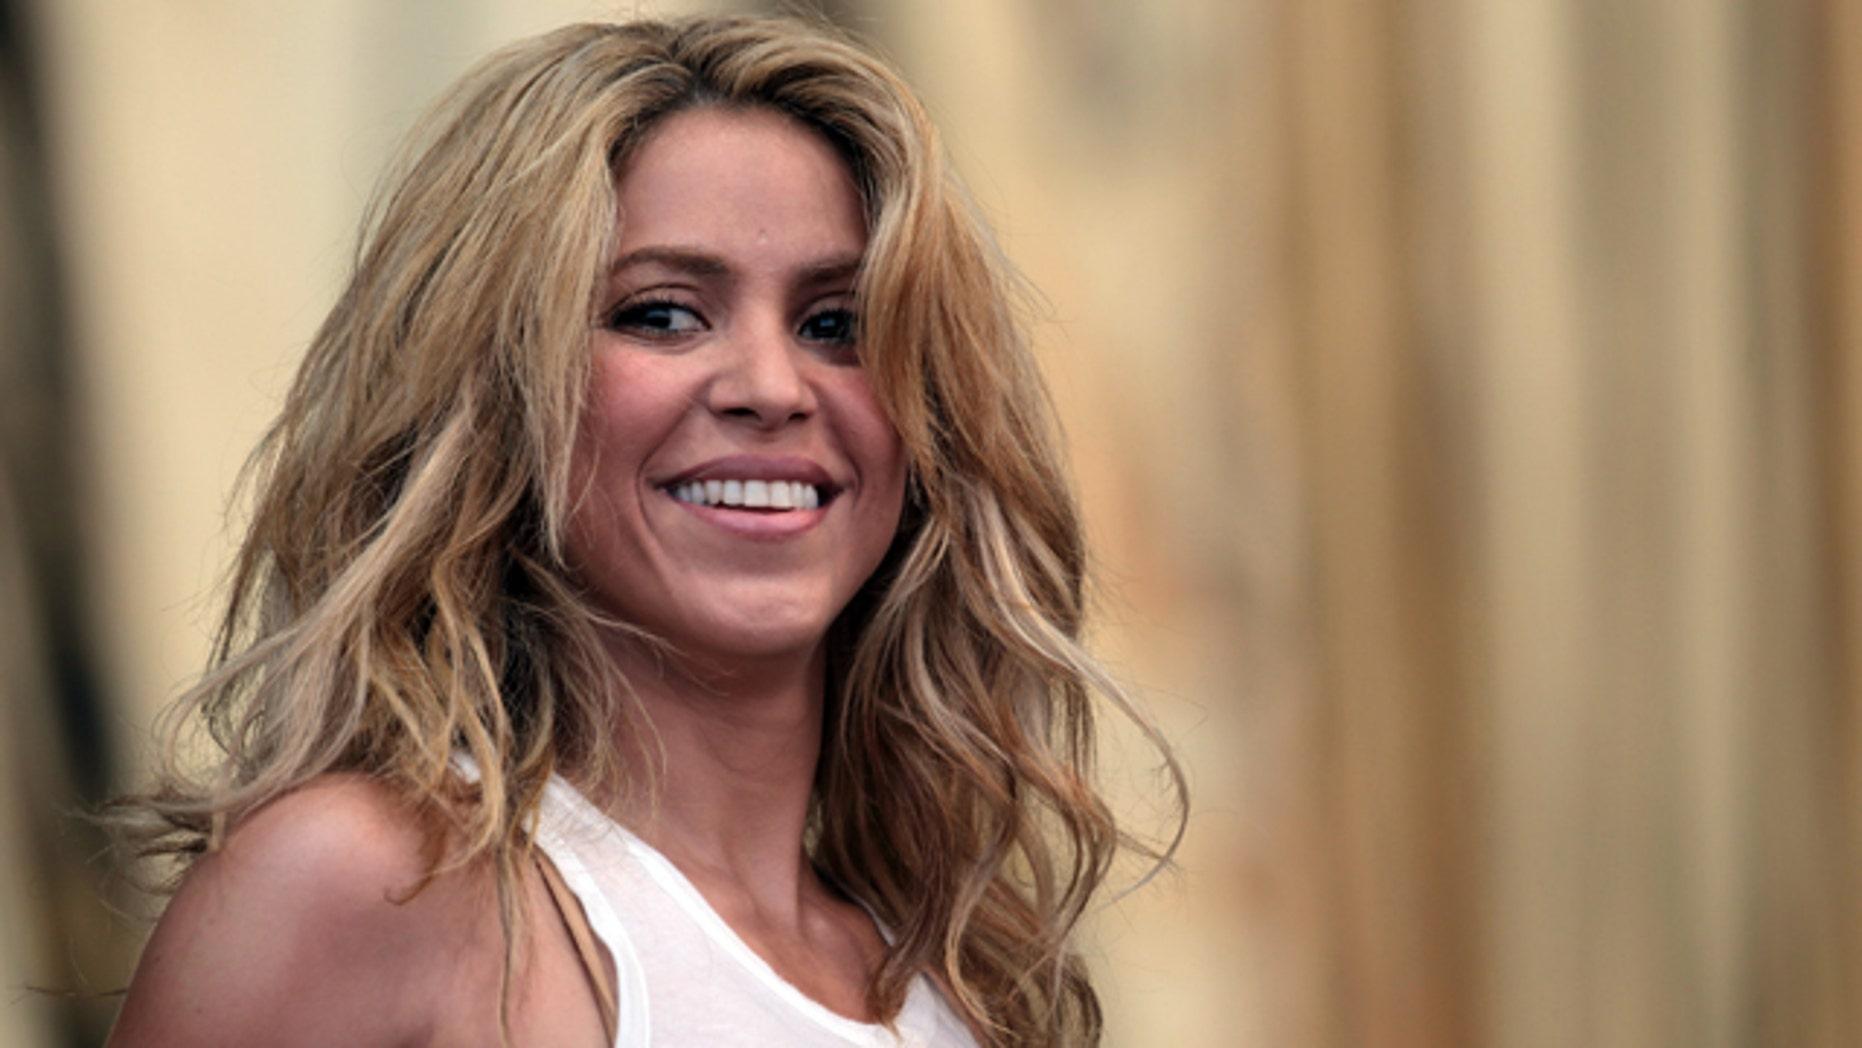 June 26, 2010: Shakira performs on the Pyramid Stage at the 2010 40th Glastonbury Festival at Worthy Farm, Pilton  in Glastonbury, England.